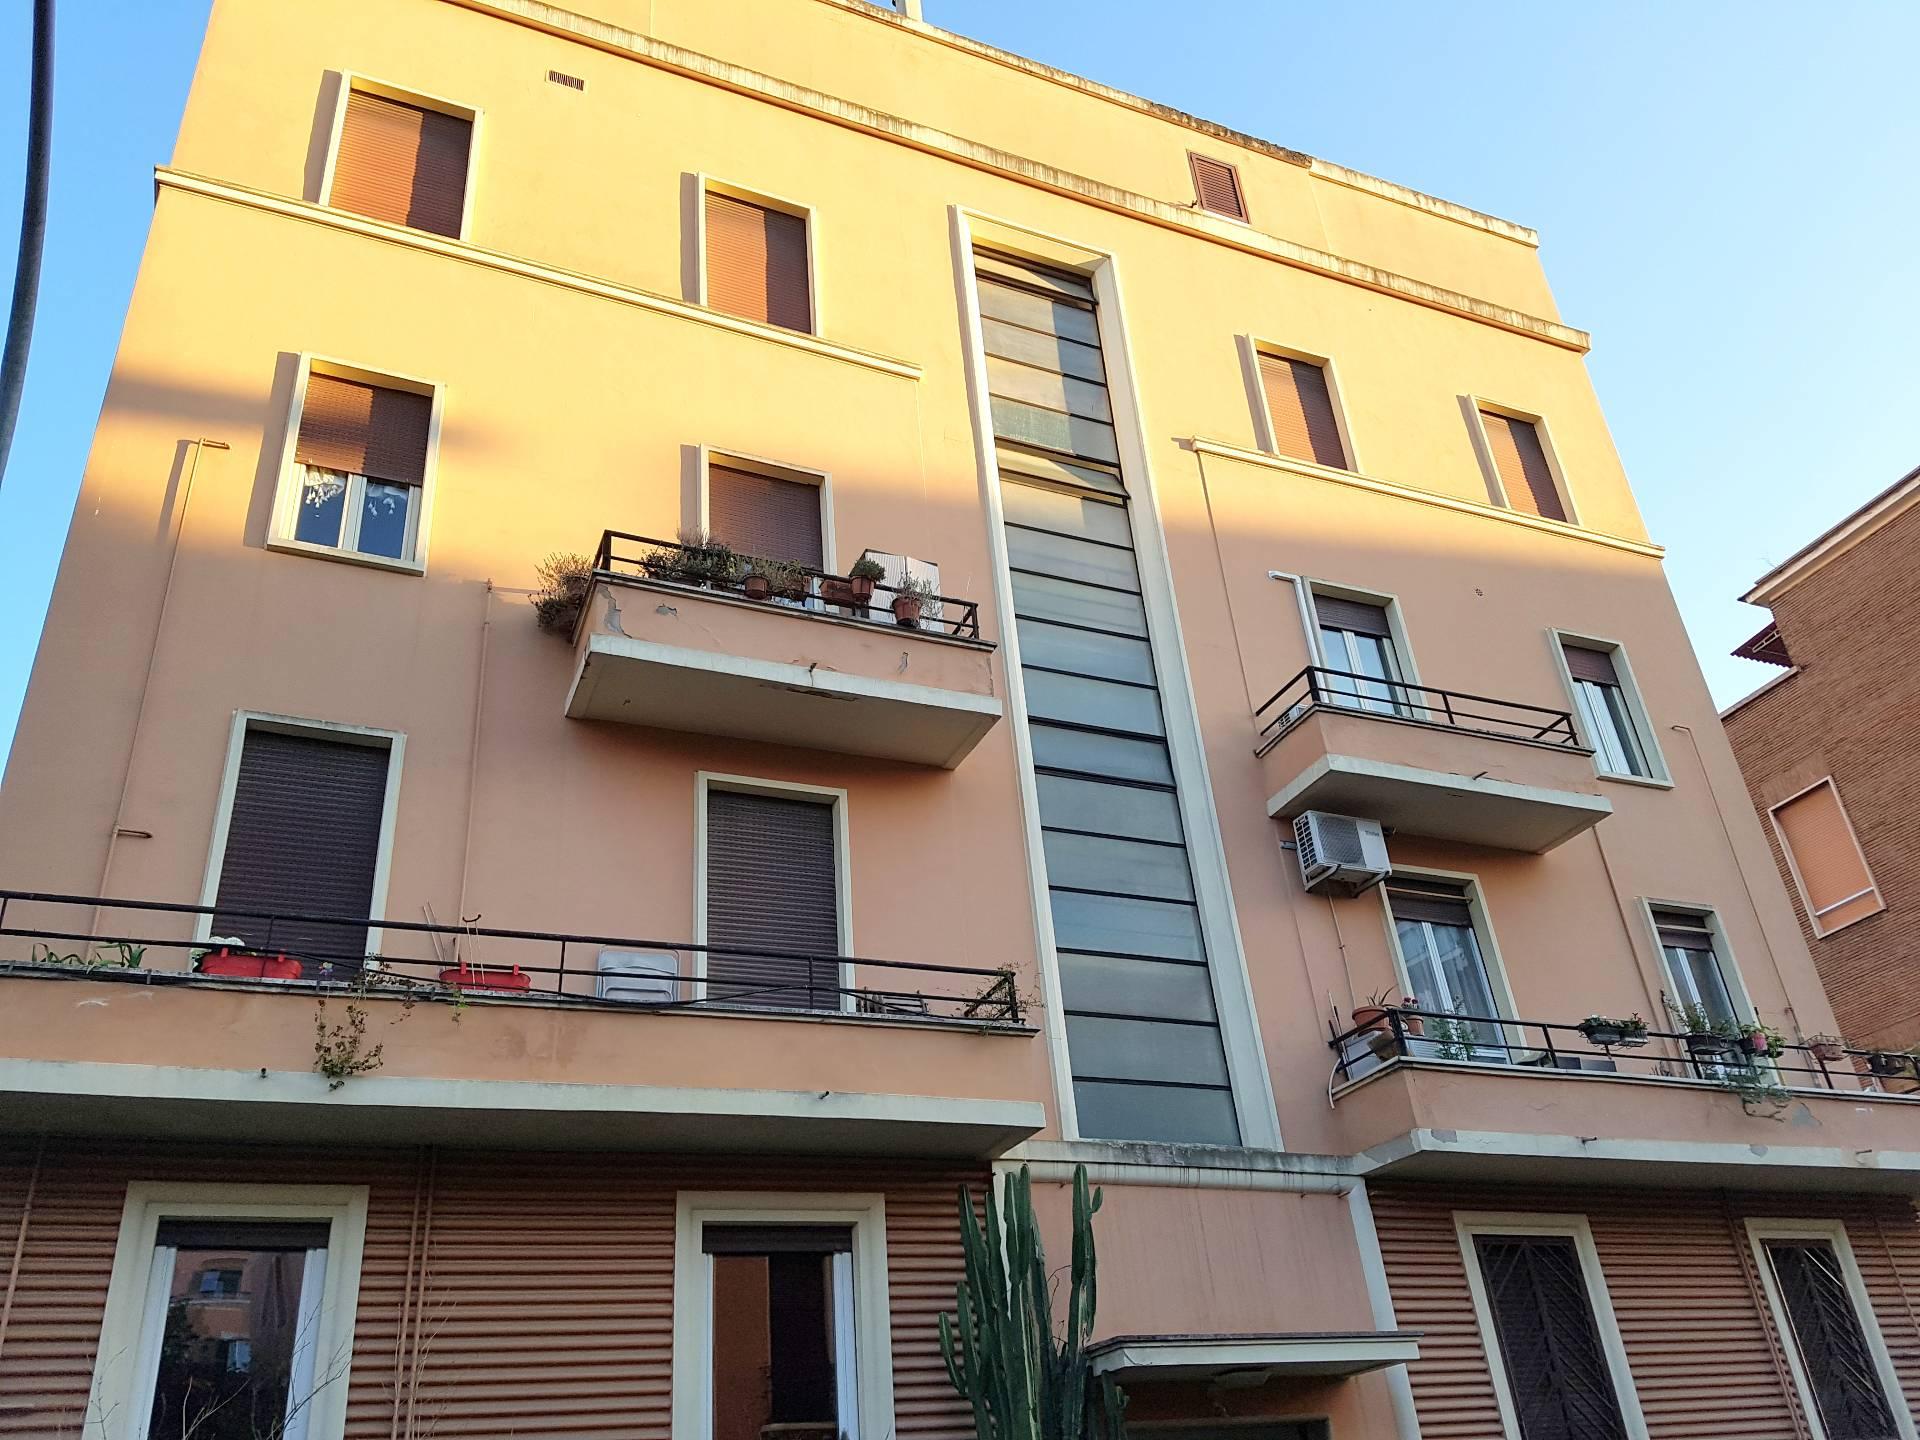 Bilocale vendita roma zona monteverde gianicolense for Bilocale vendita roma centro